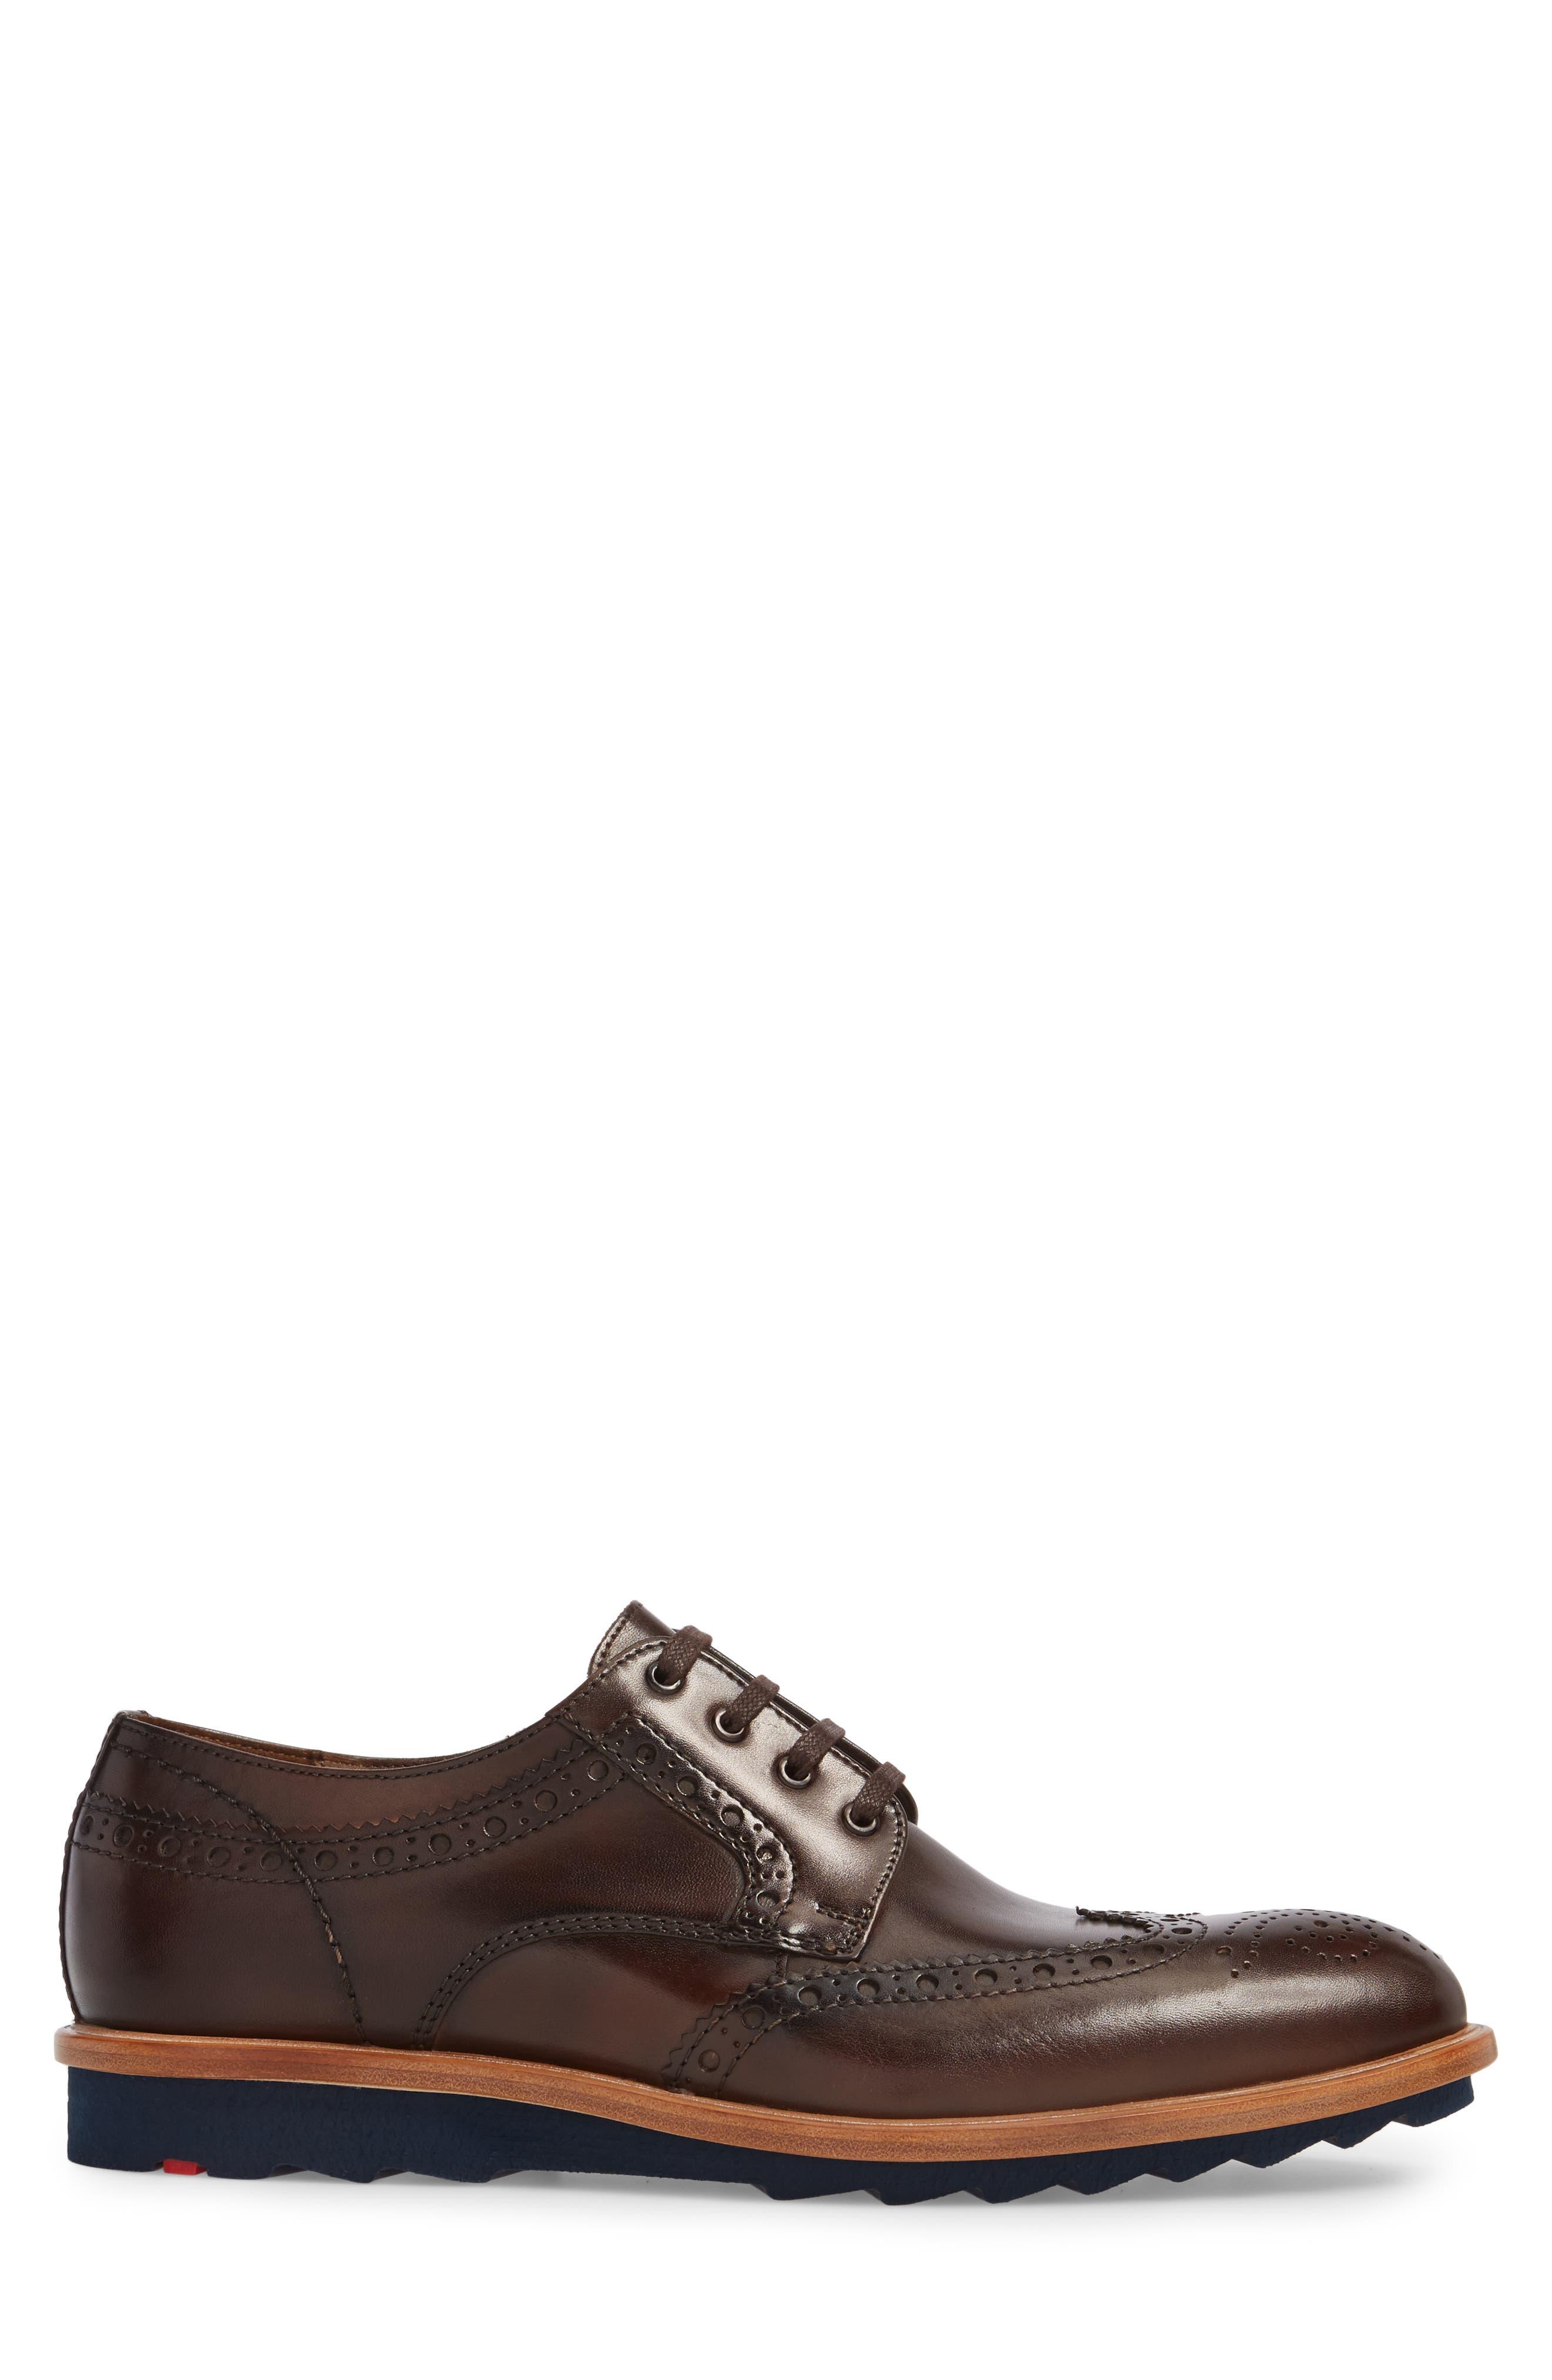 Fairbanks Wingtip,                             Alternate thumbnail 3, color,                             Brown Leather